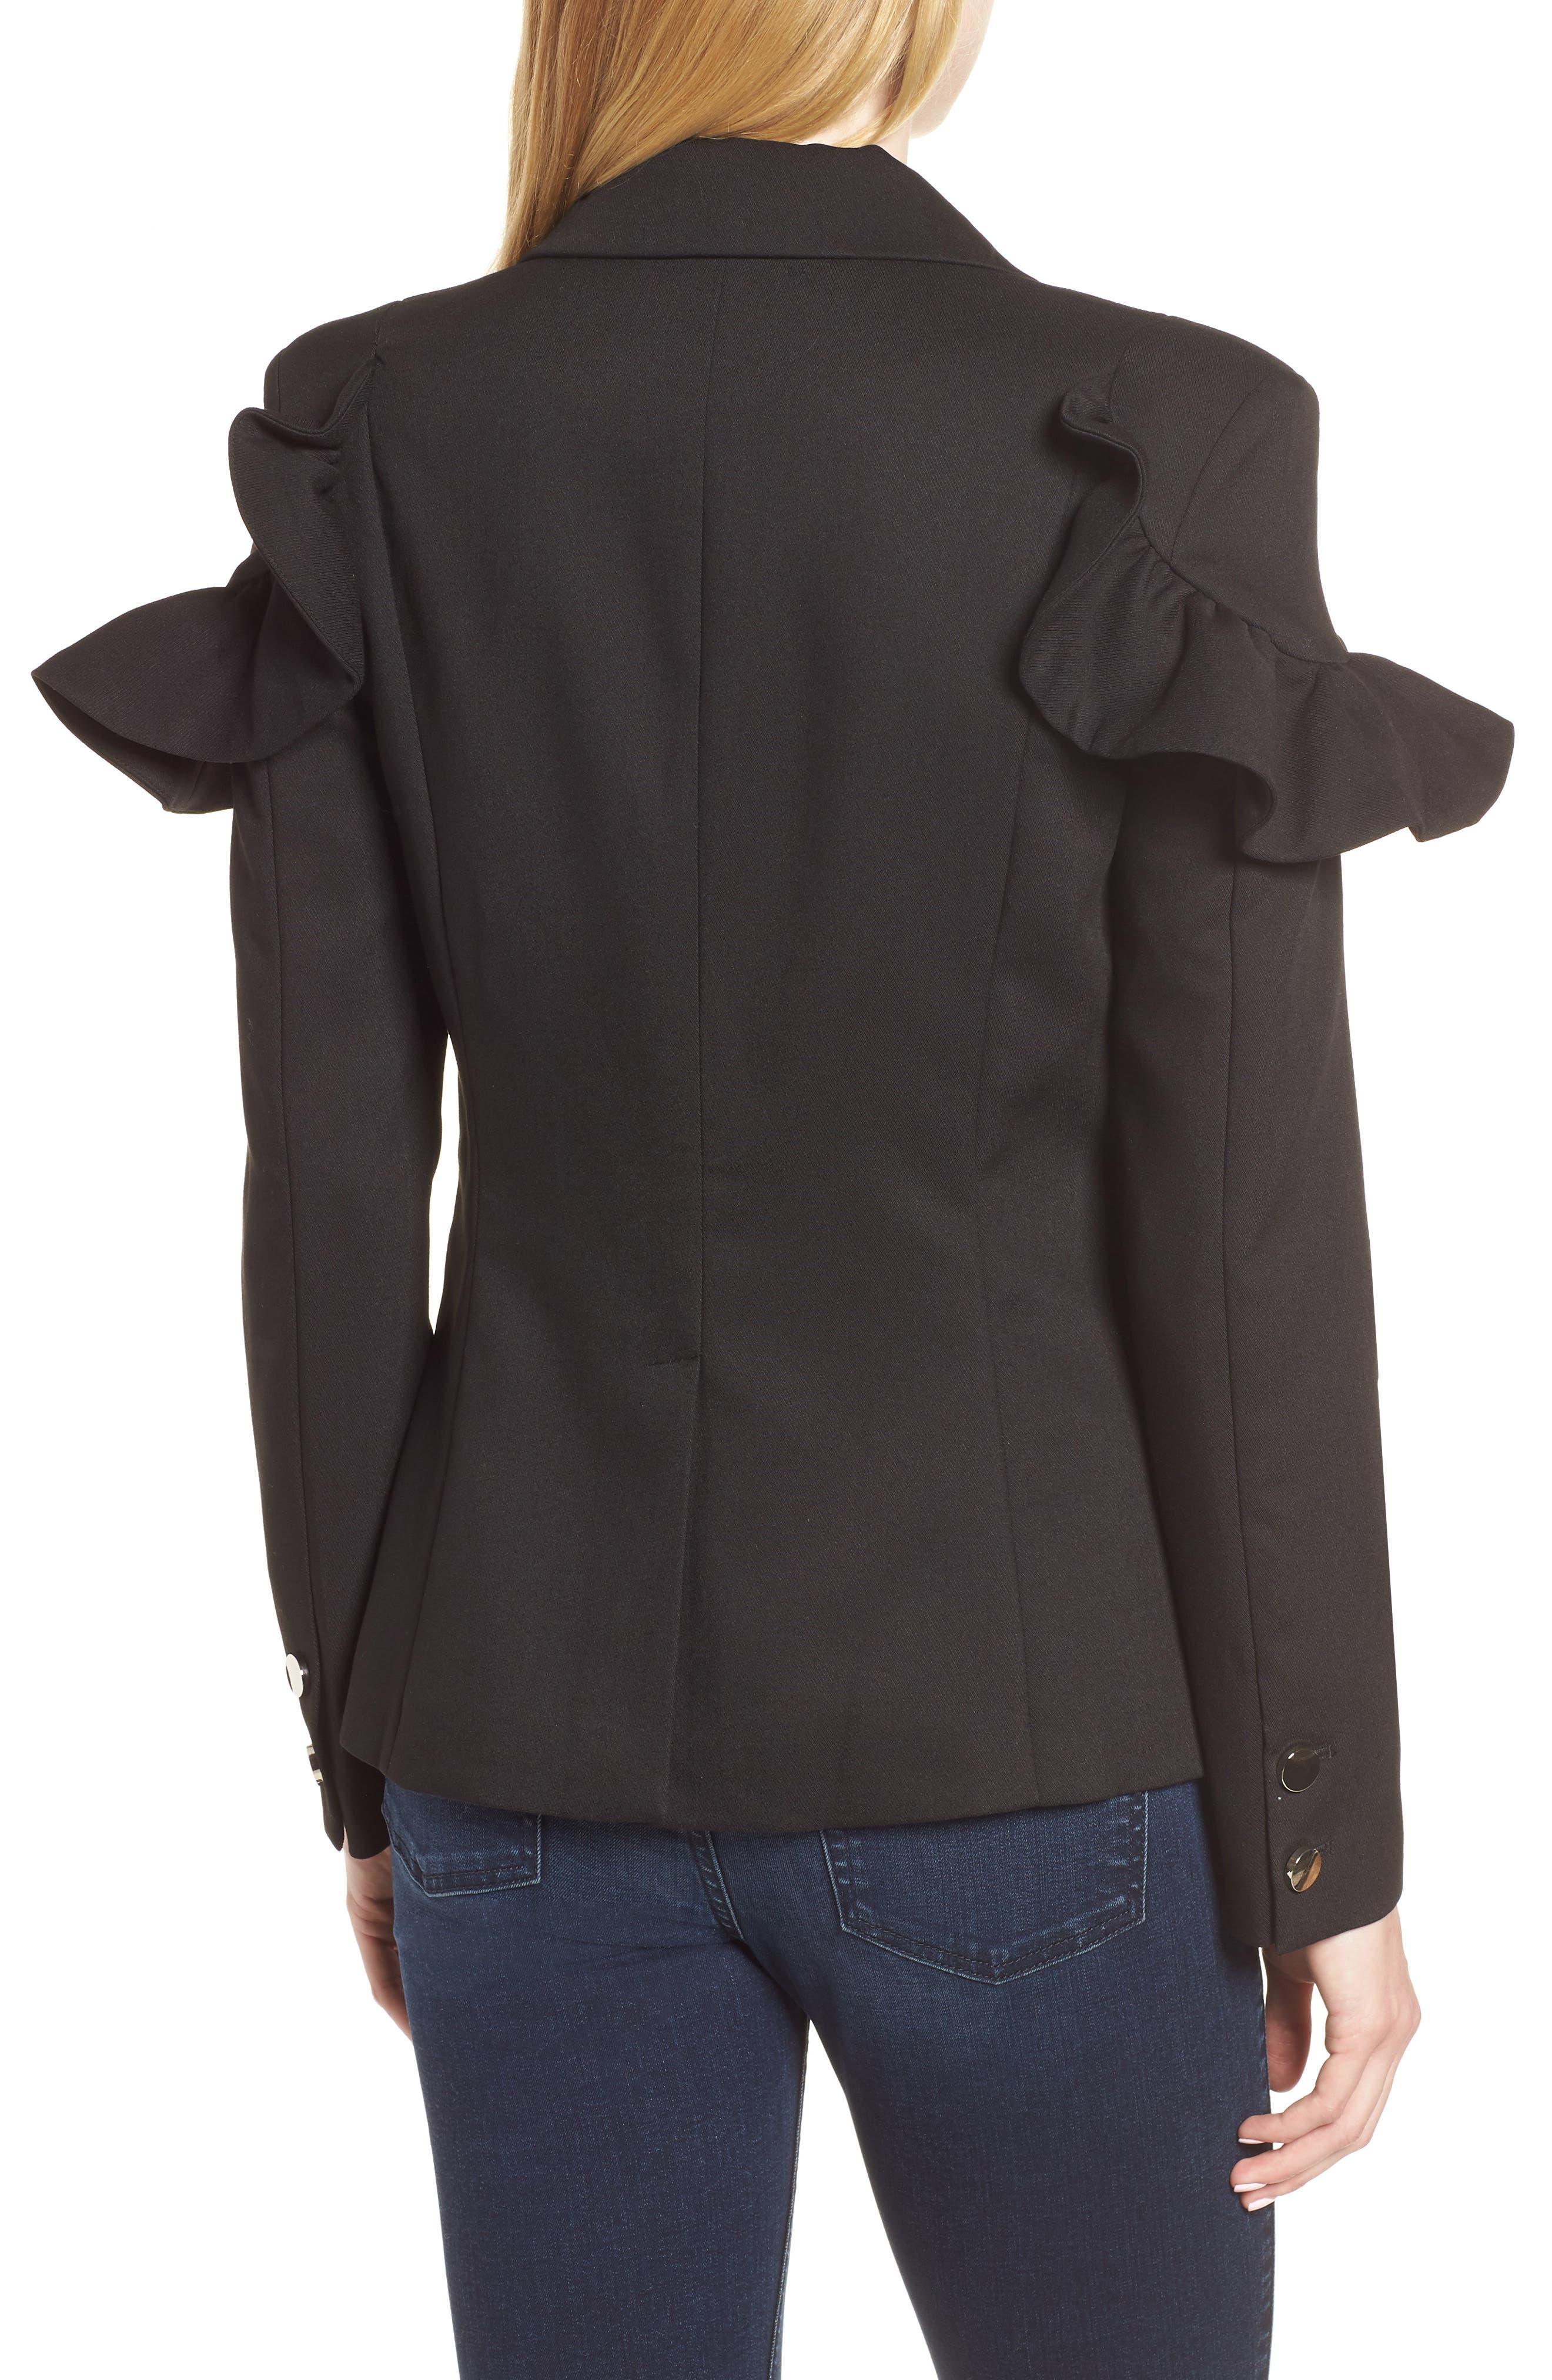 Harmony Jacket,                             Alternate thumbnail 2, color,